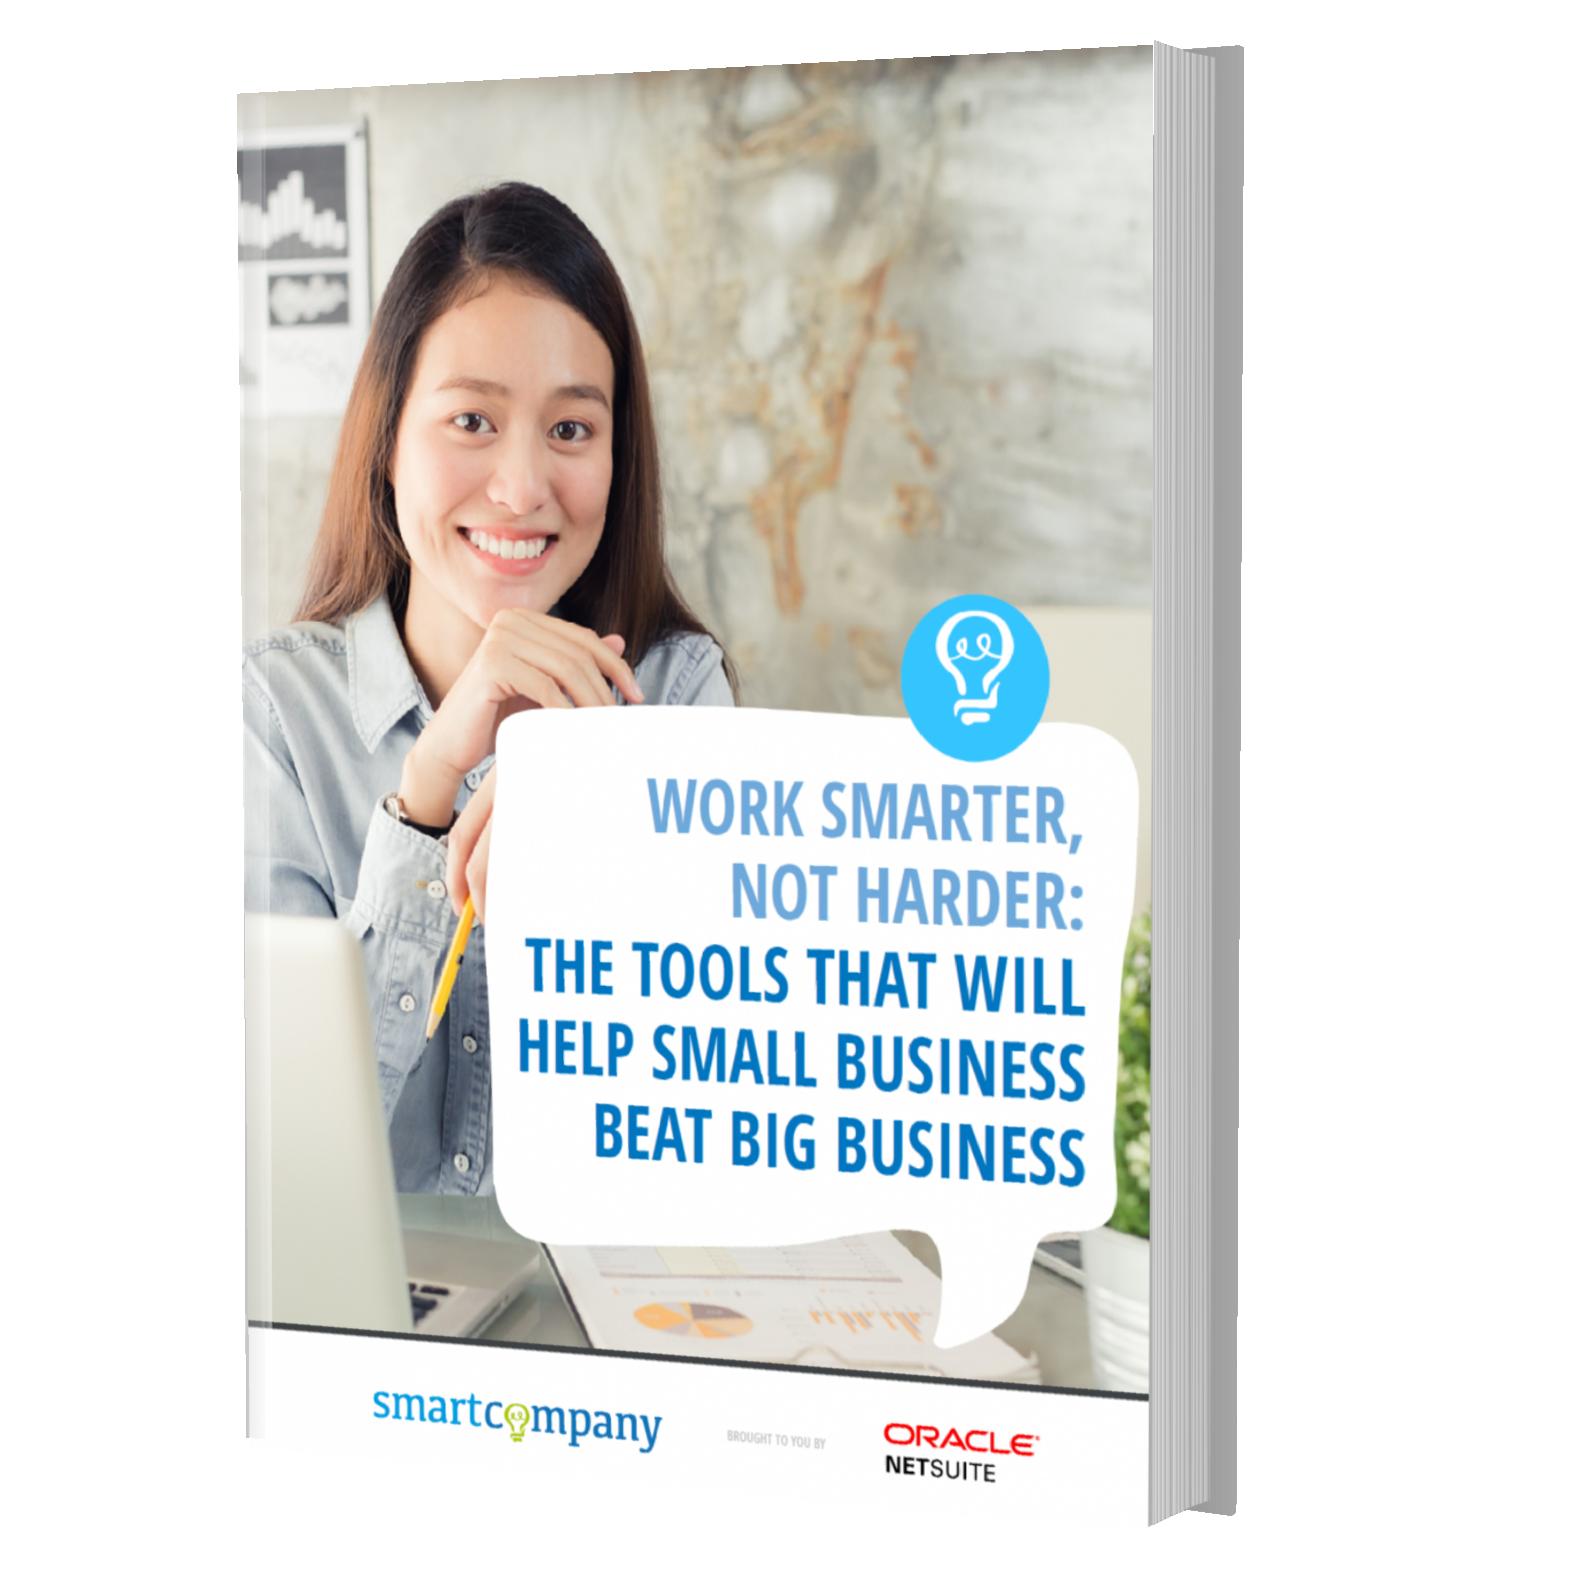 NS-TOFU-Ebook-Work-Smarter-Not-Harder Ebook